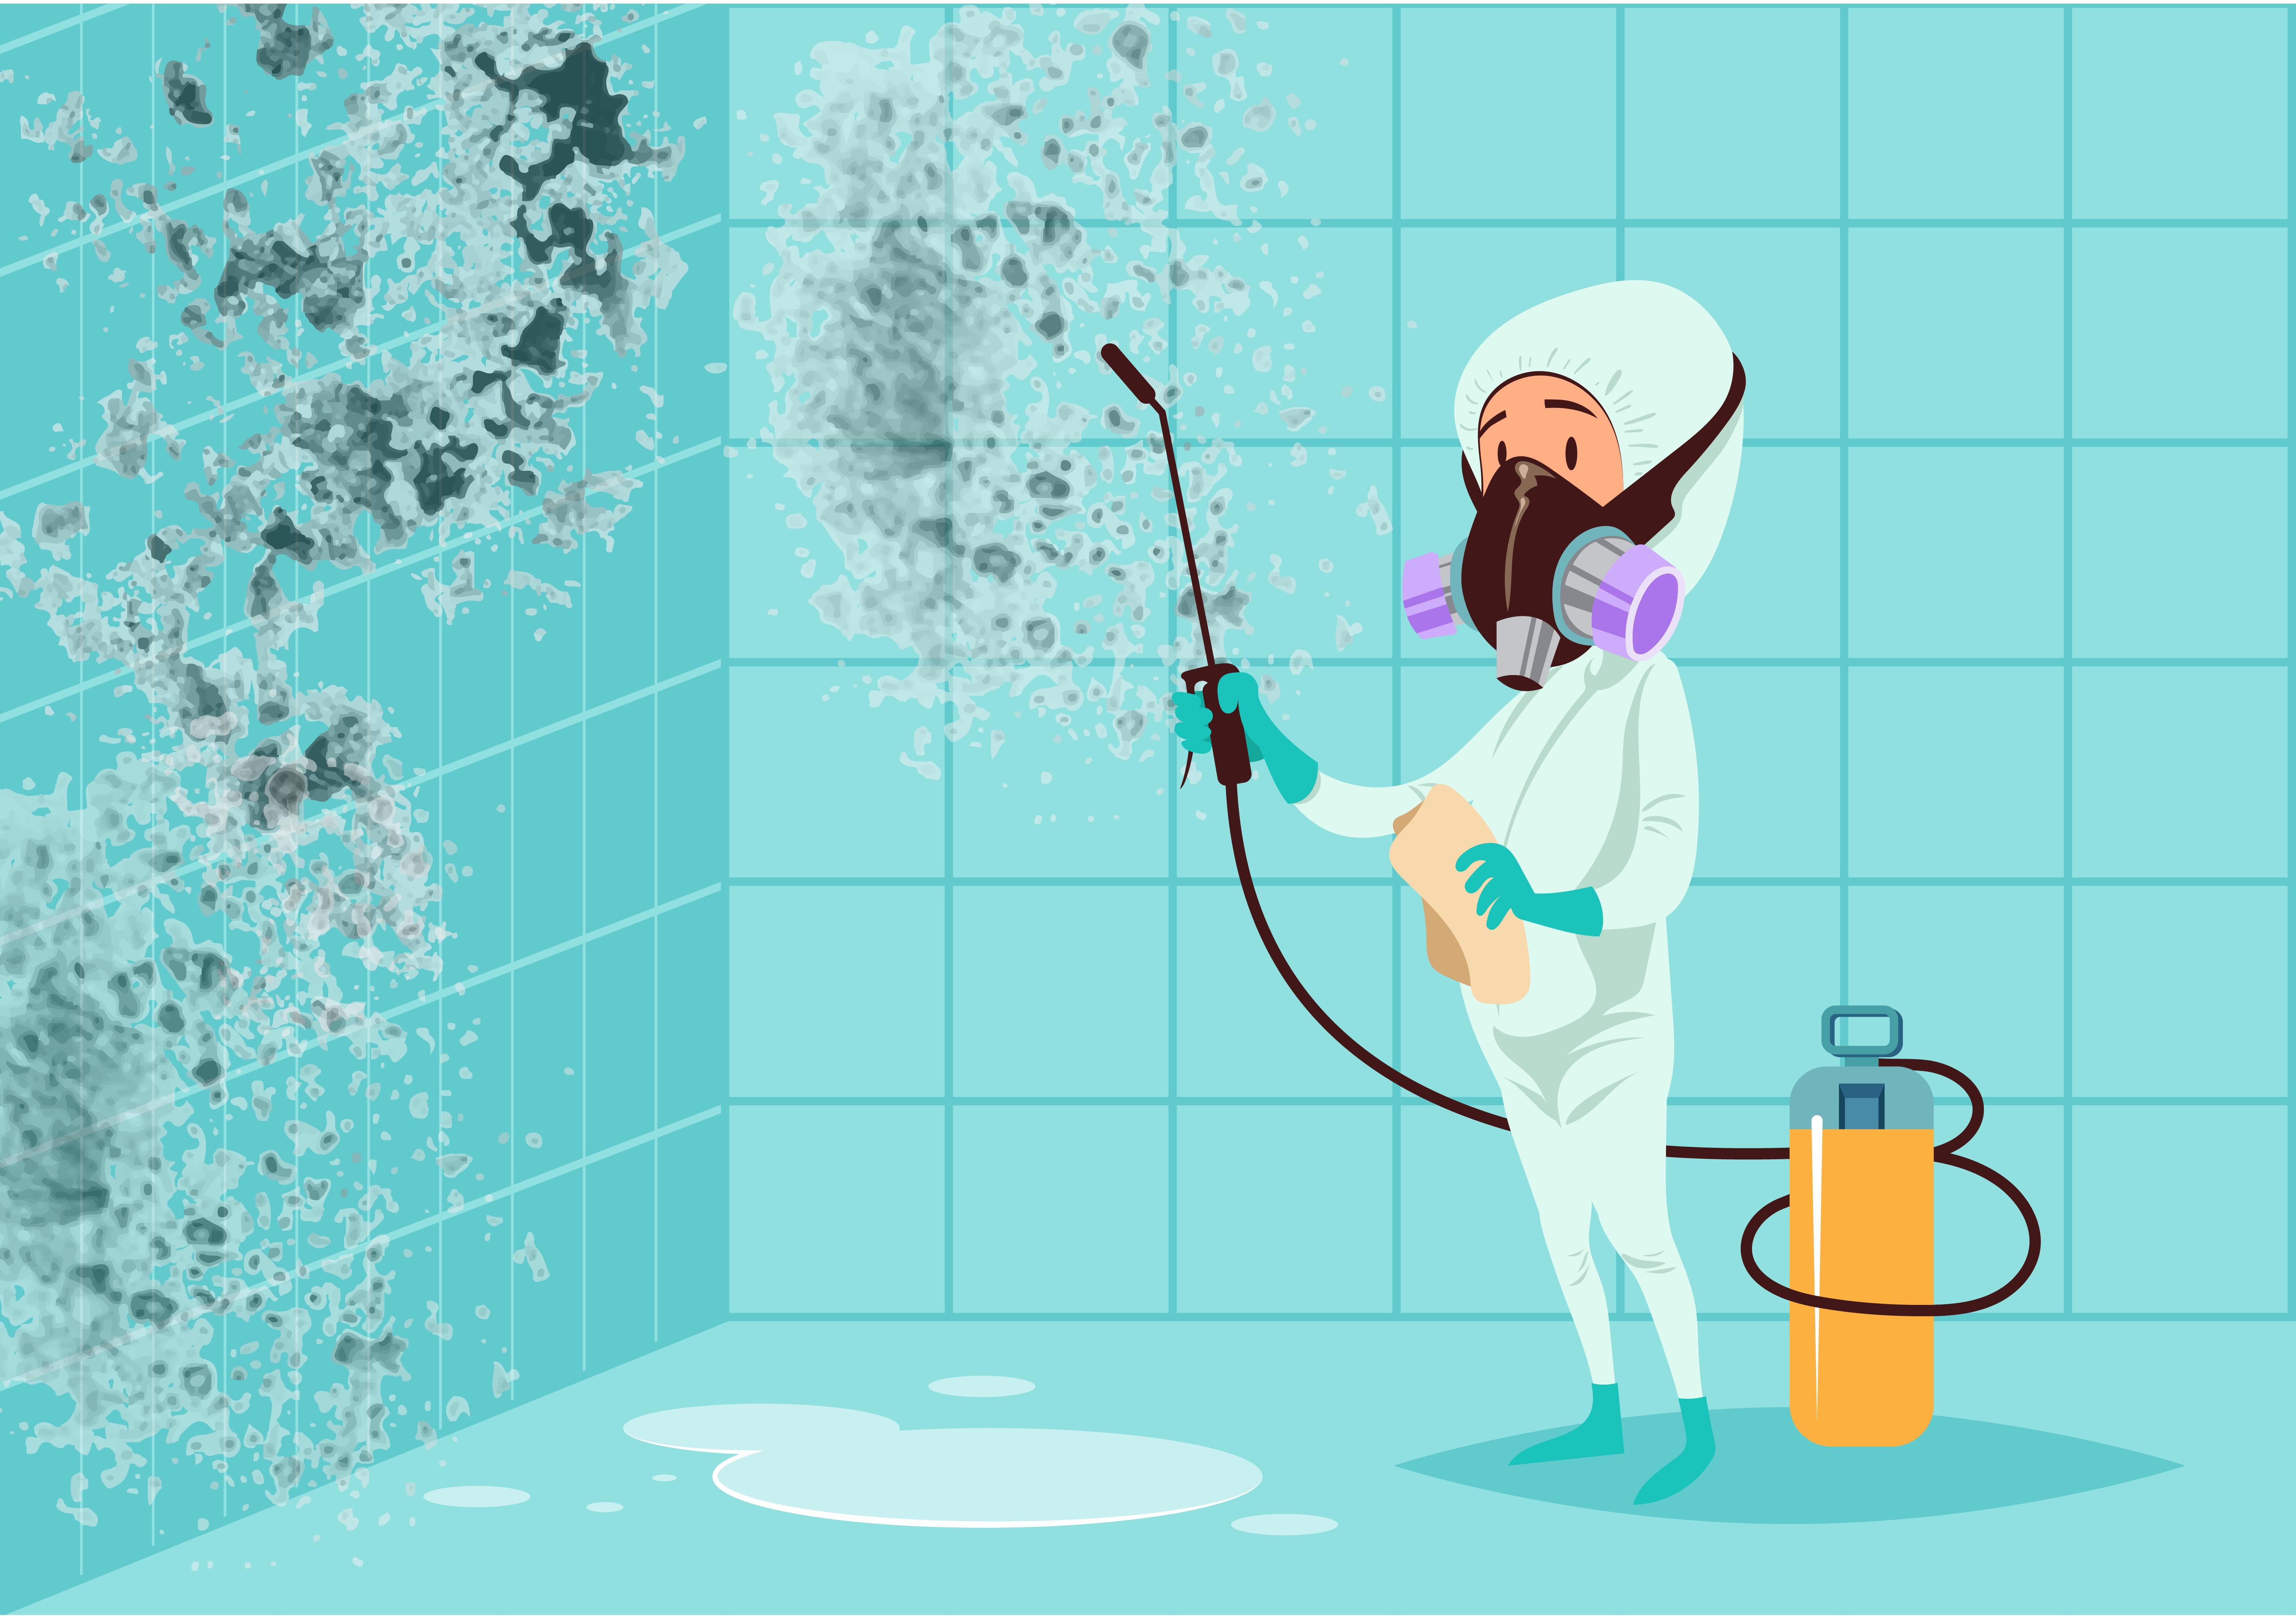 Mofo nas paredes: como removê-lo?